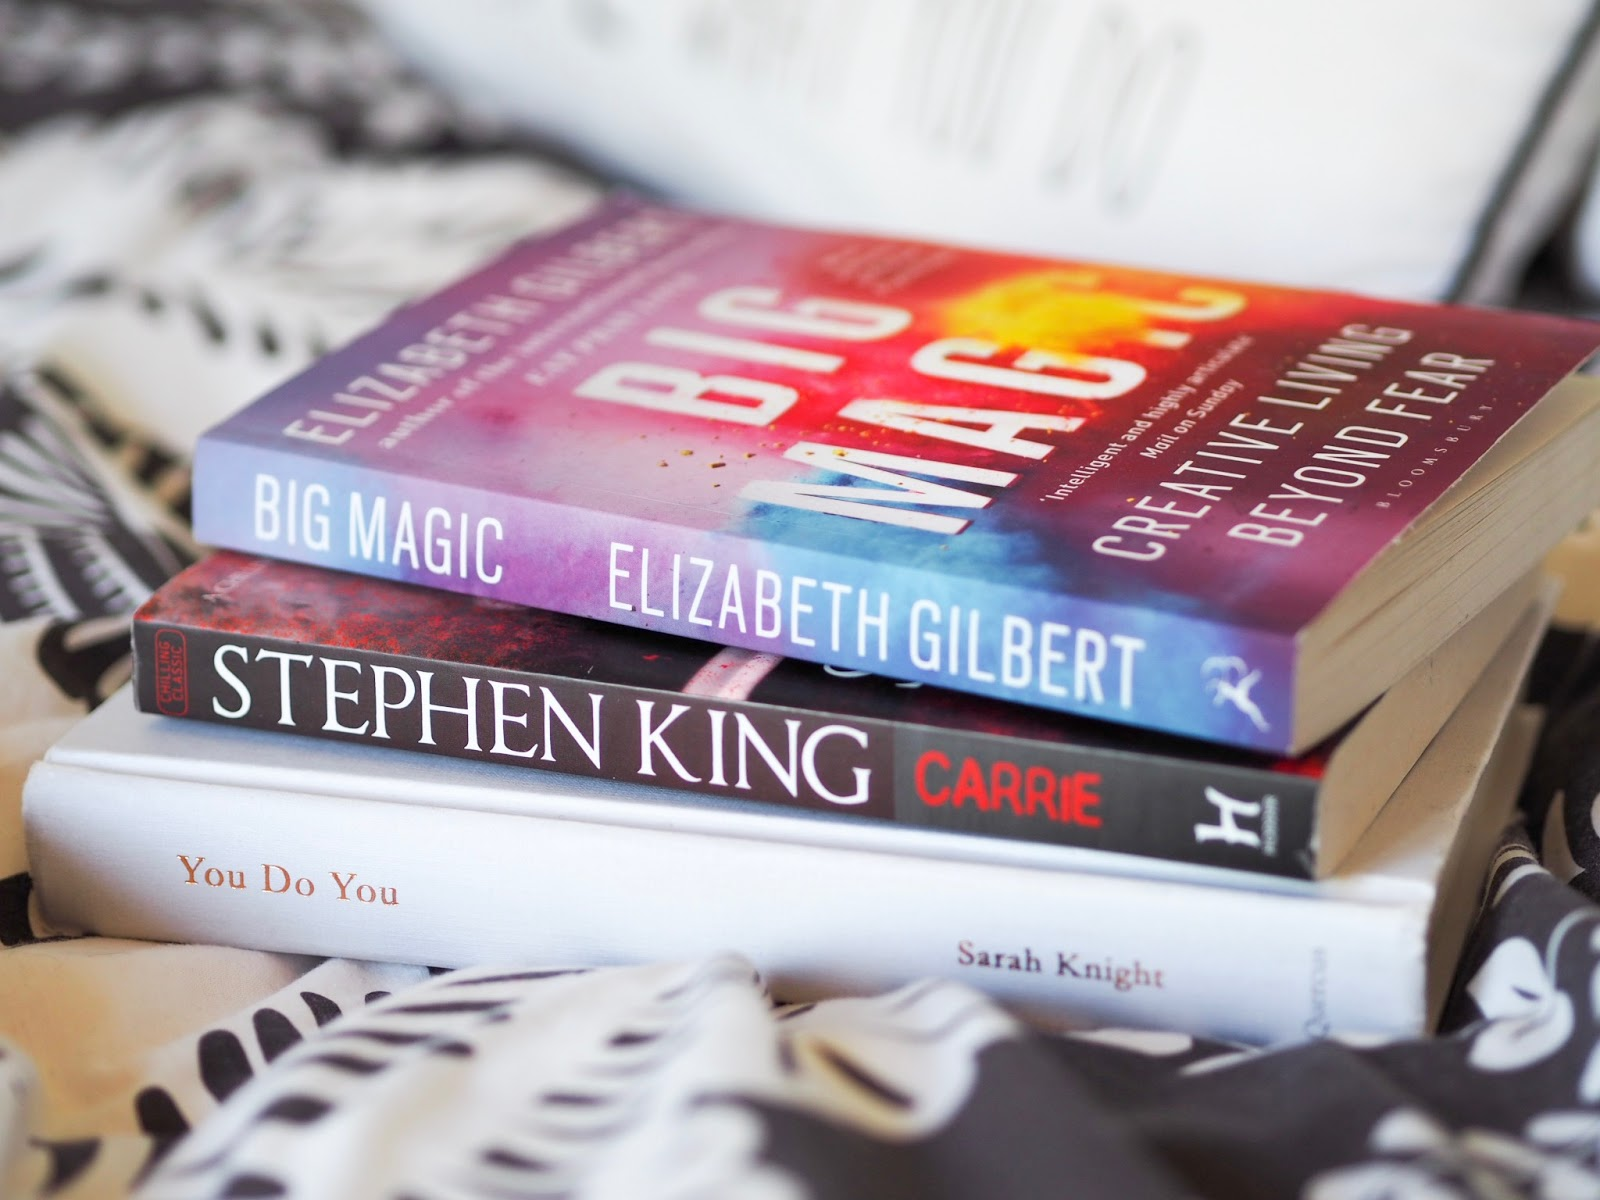 Three books on bed